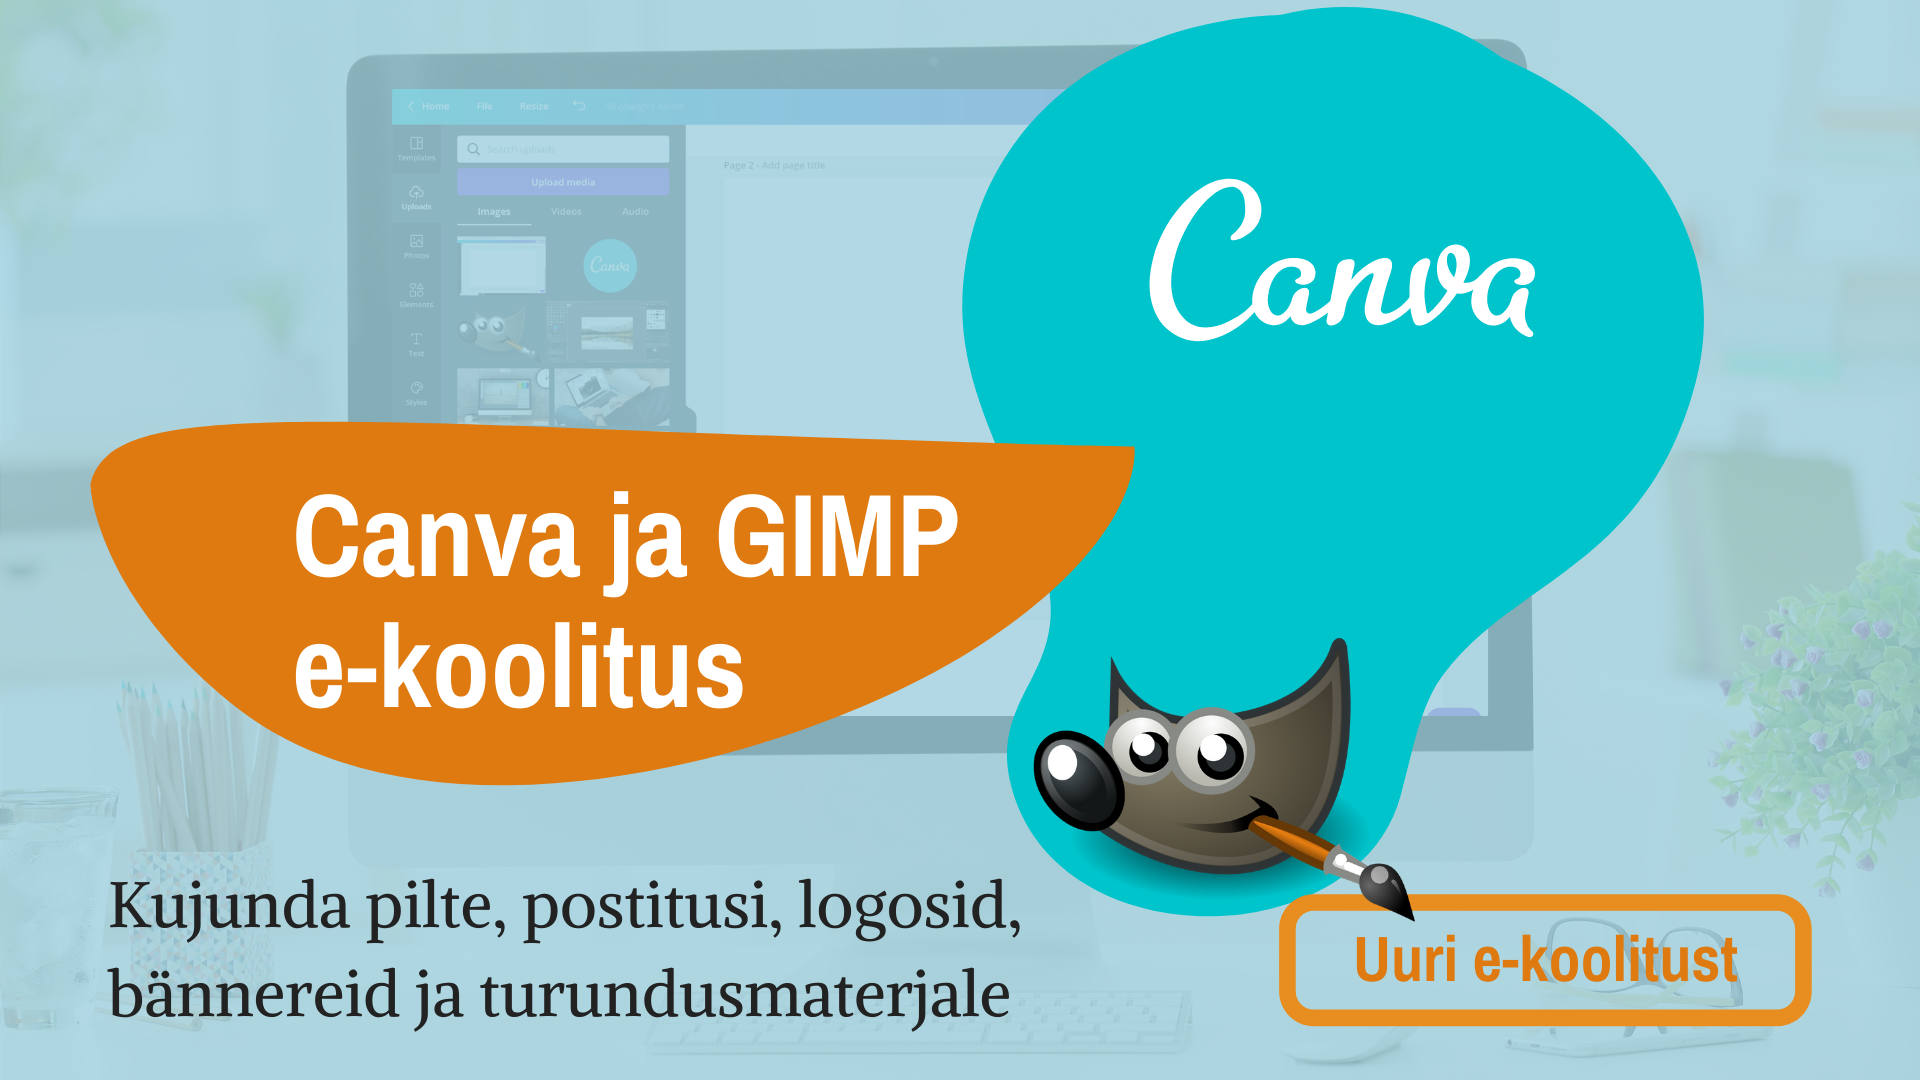 GIMP ja Canva koolitus